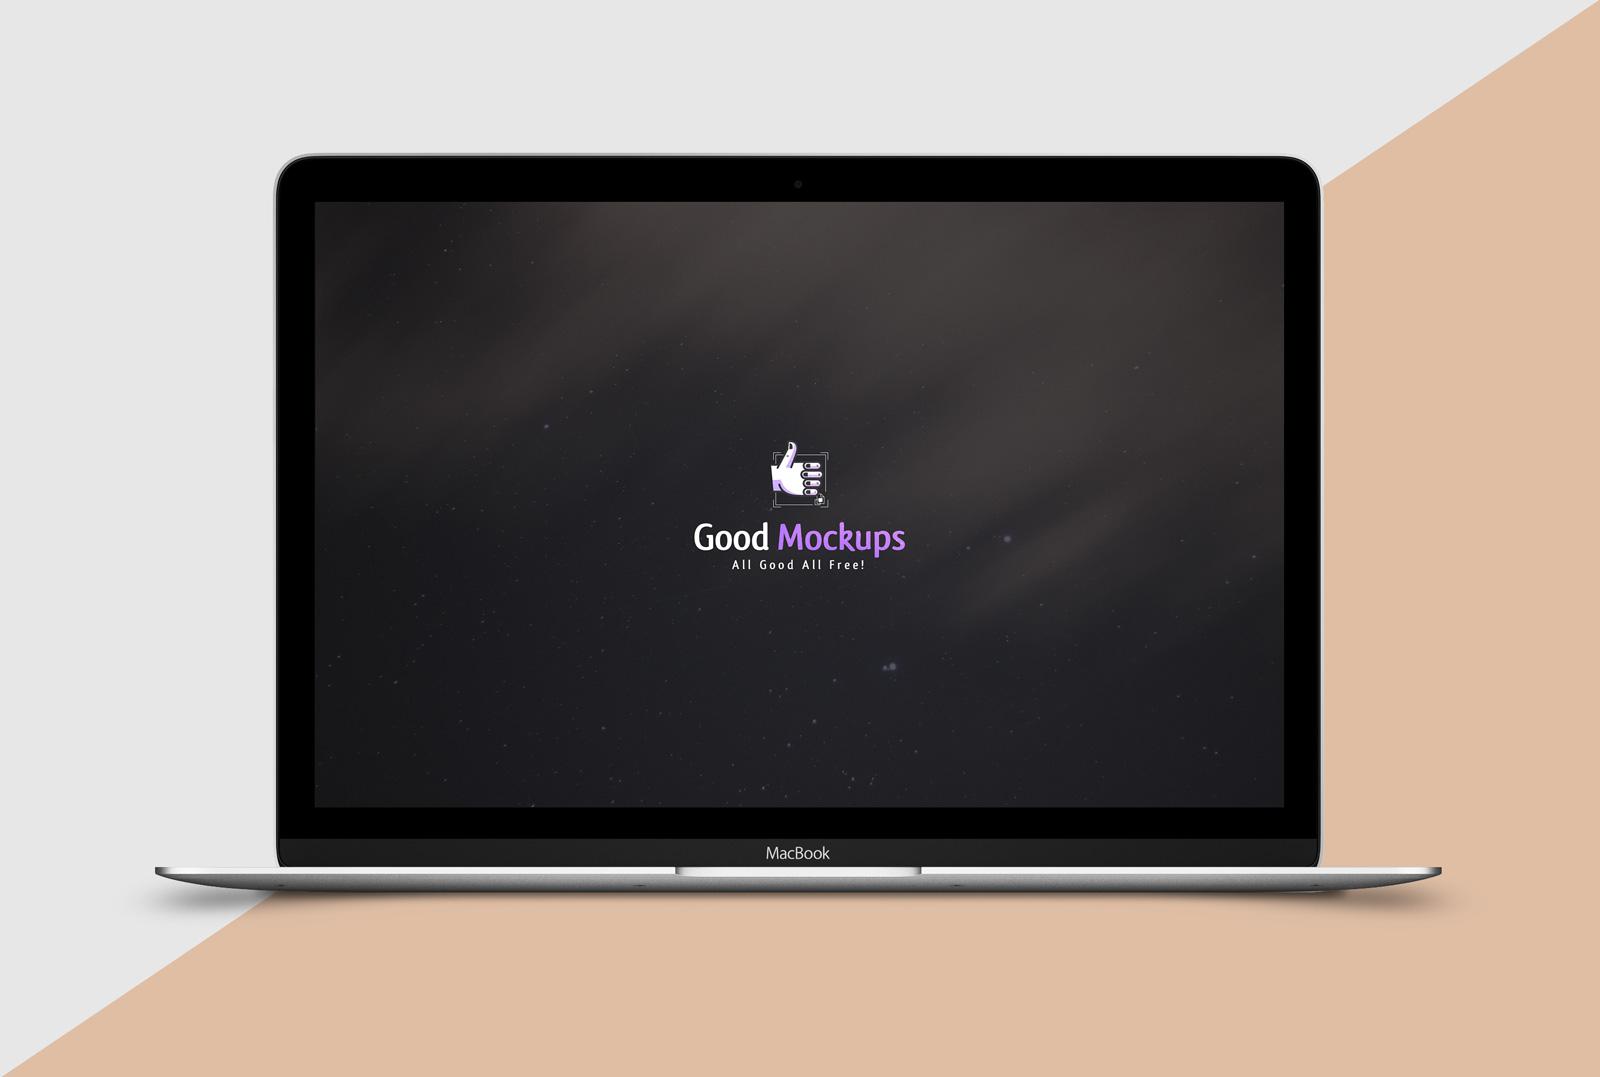 Free-Apple-MacbBook-Pro-Silver-Mockup-PSD